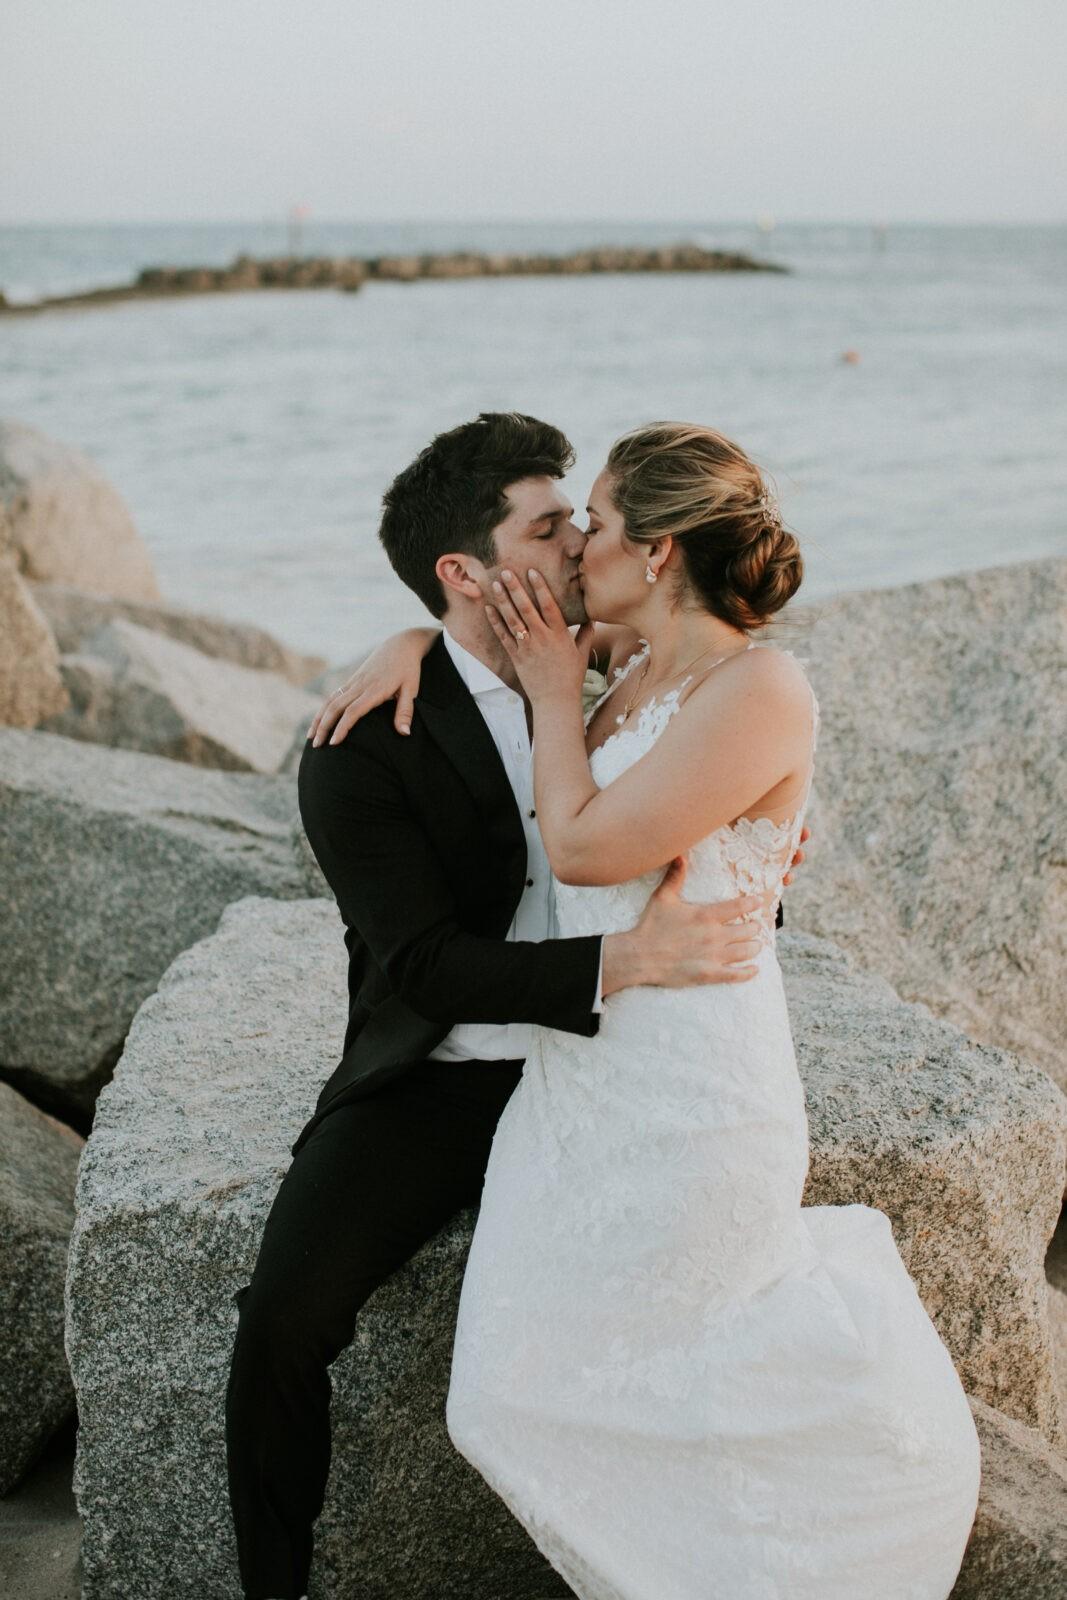 romantic beach wedding photos